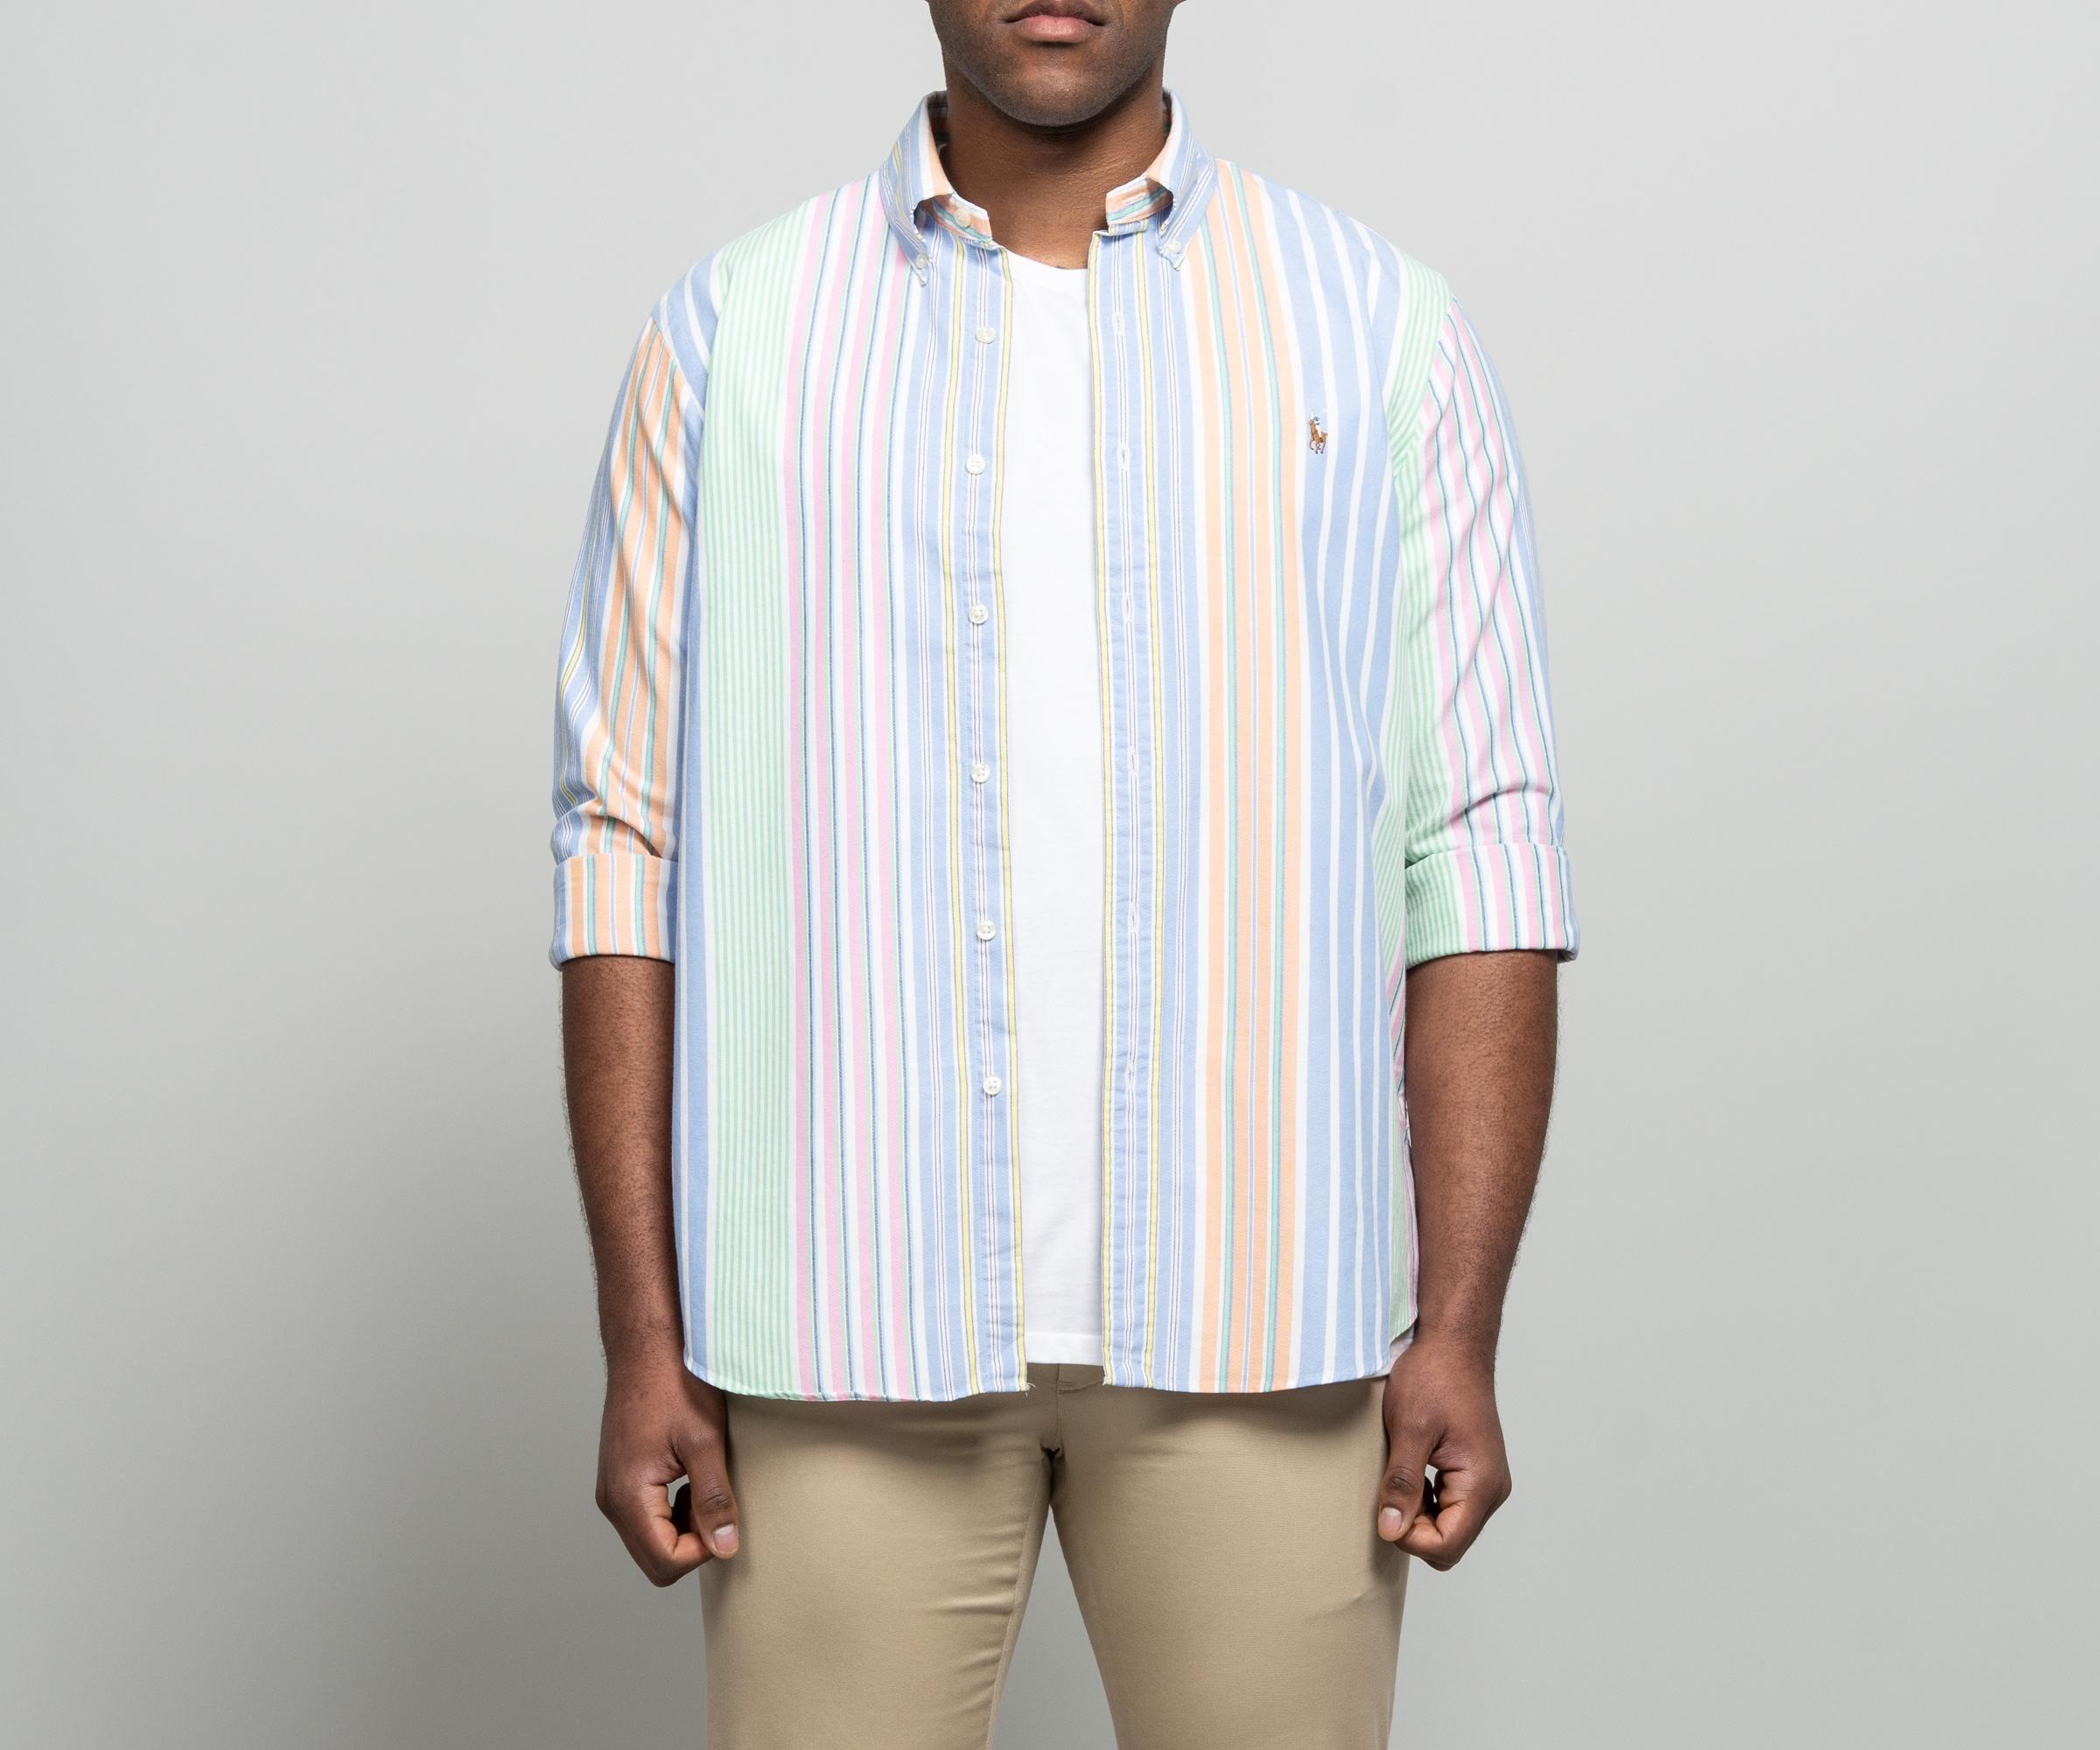 Ralph Lauren Large Custom Fit Blue Shirt Striped